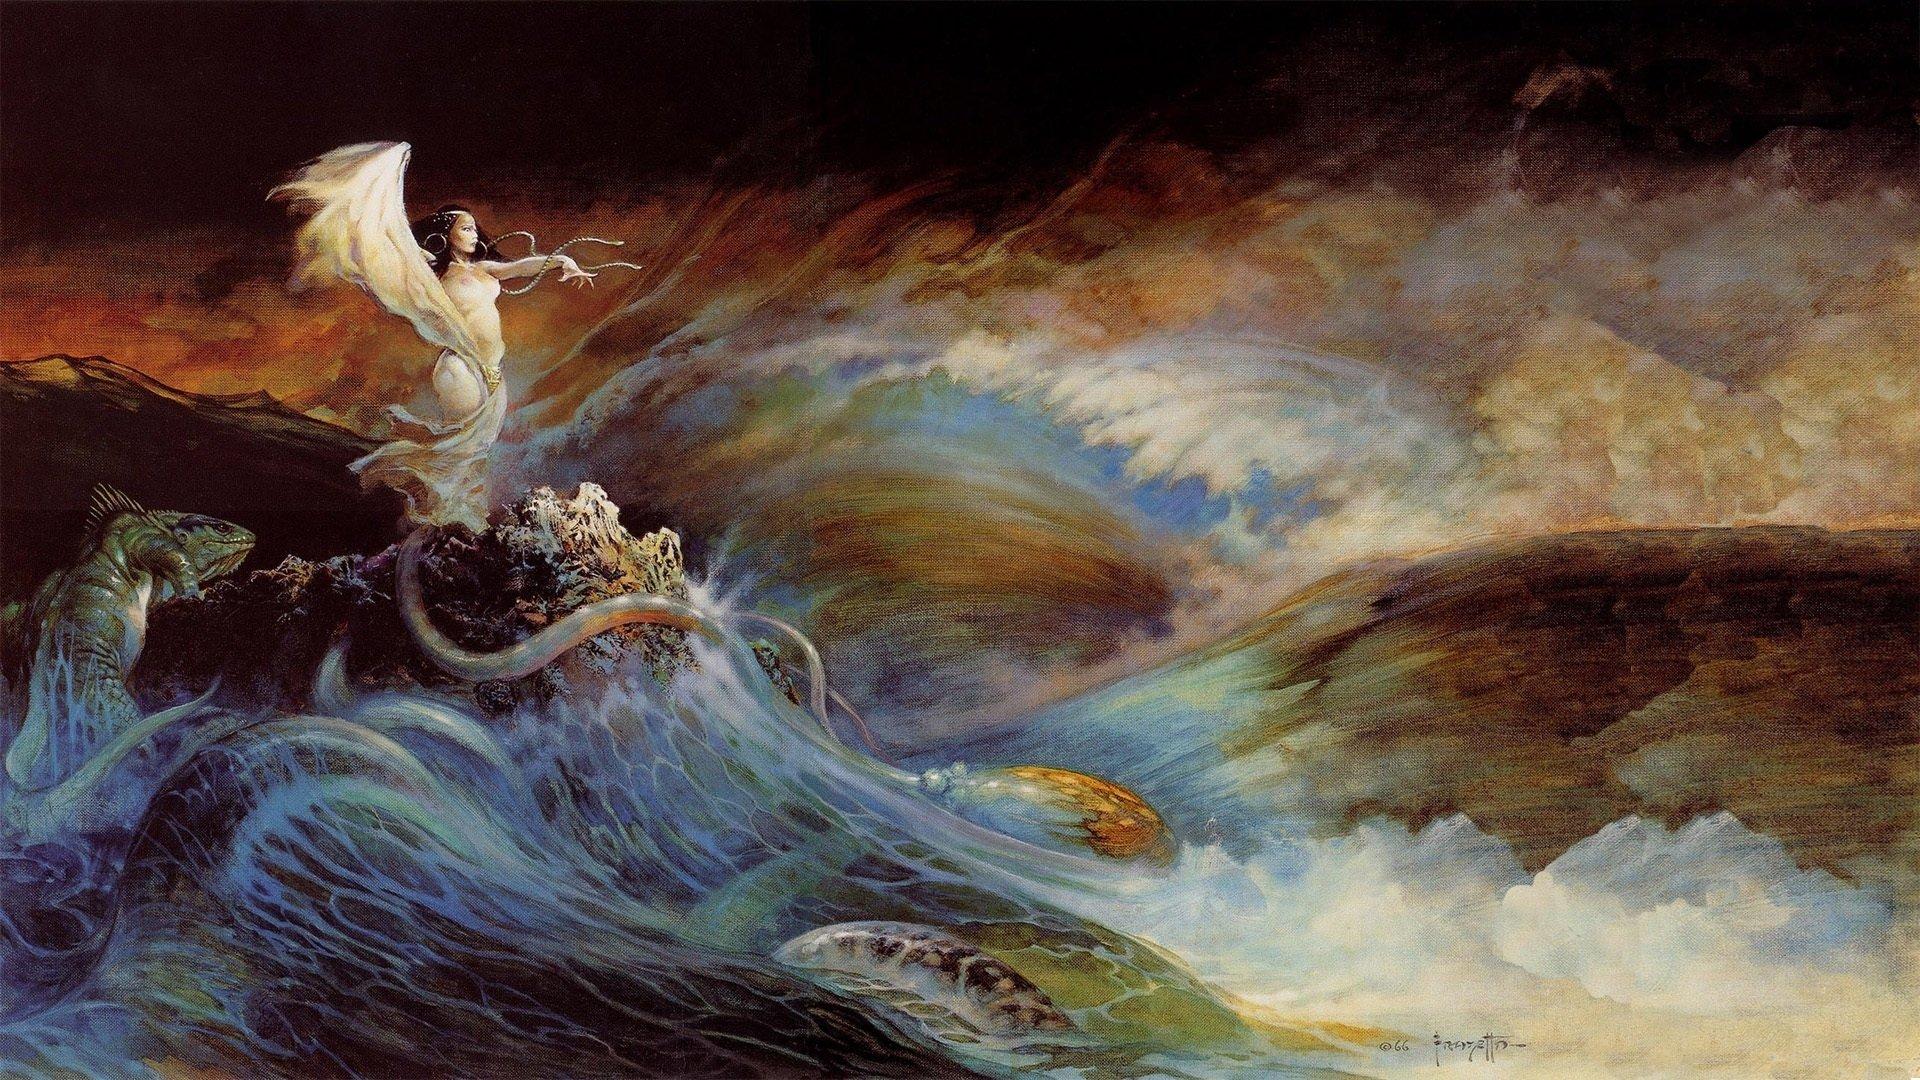 17 Wallpapers by Frank Frazetta 1920x1080